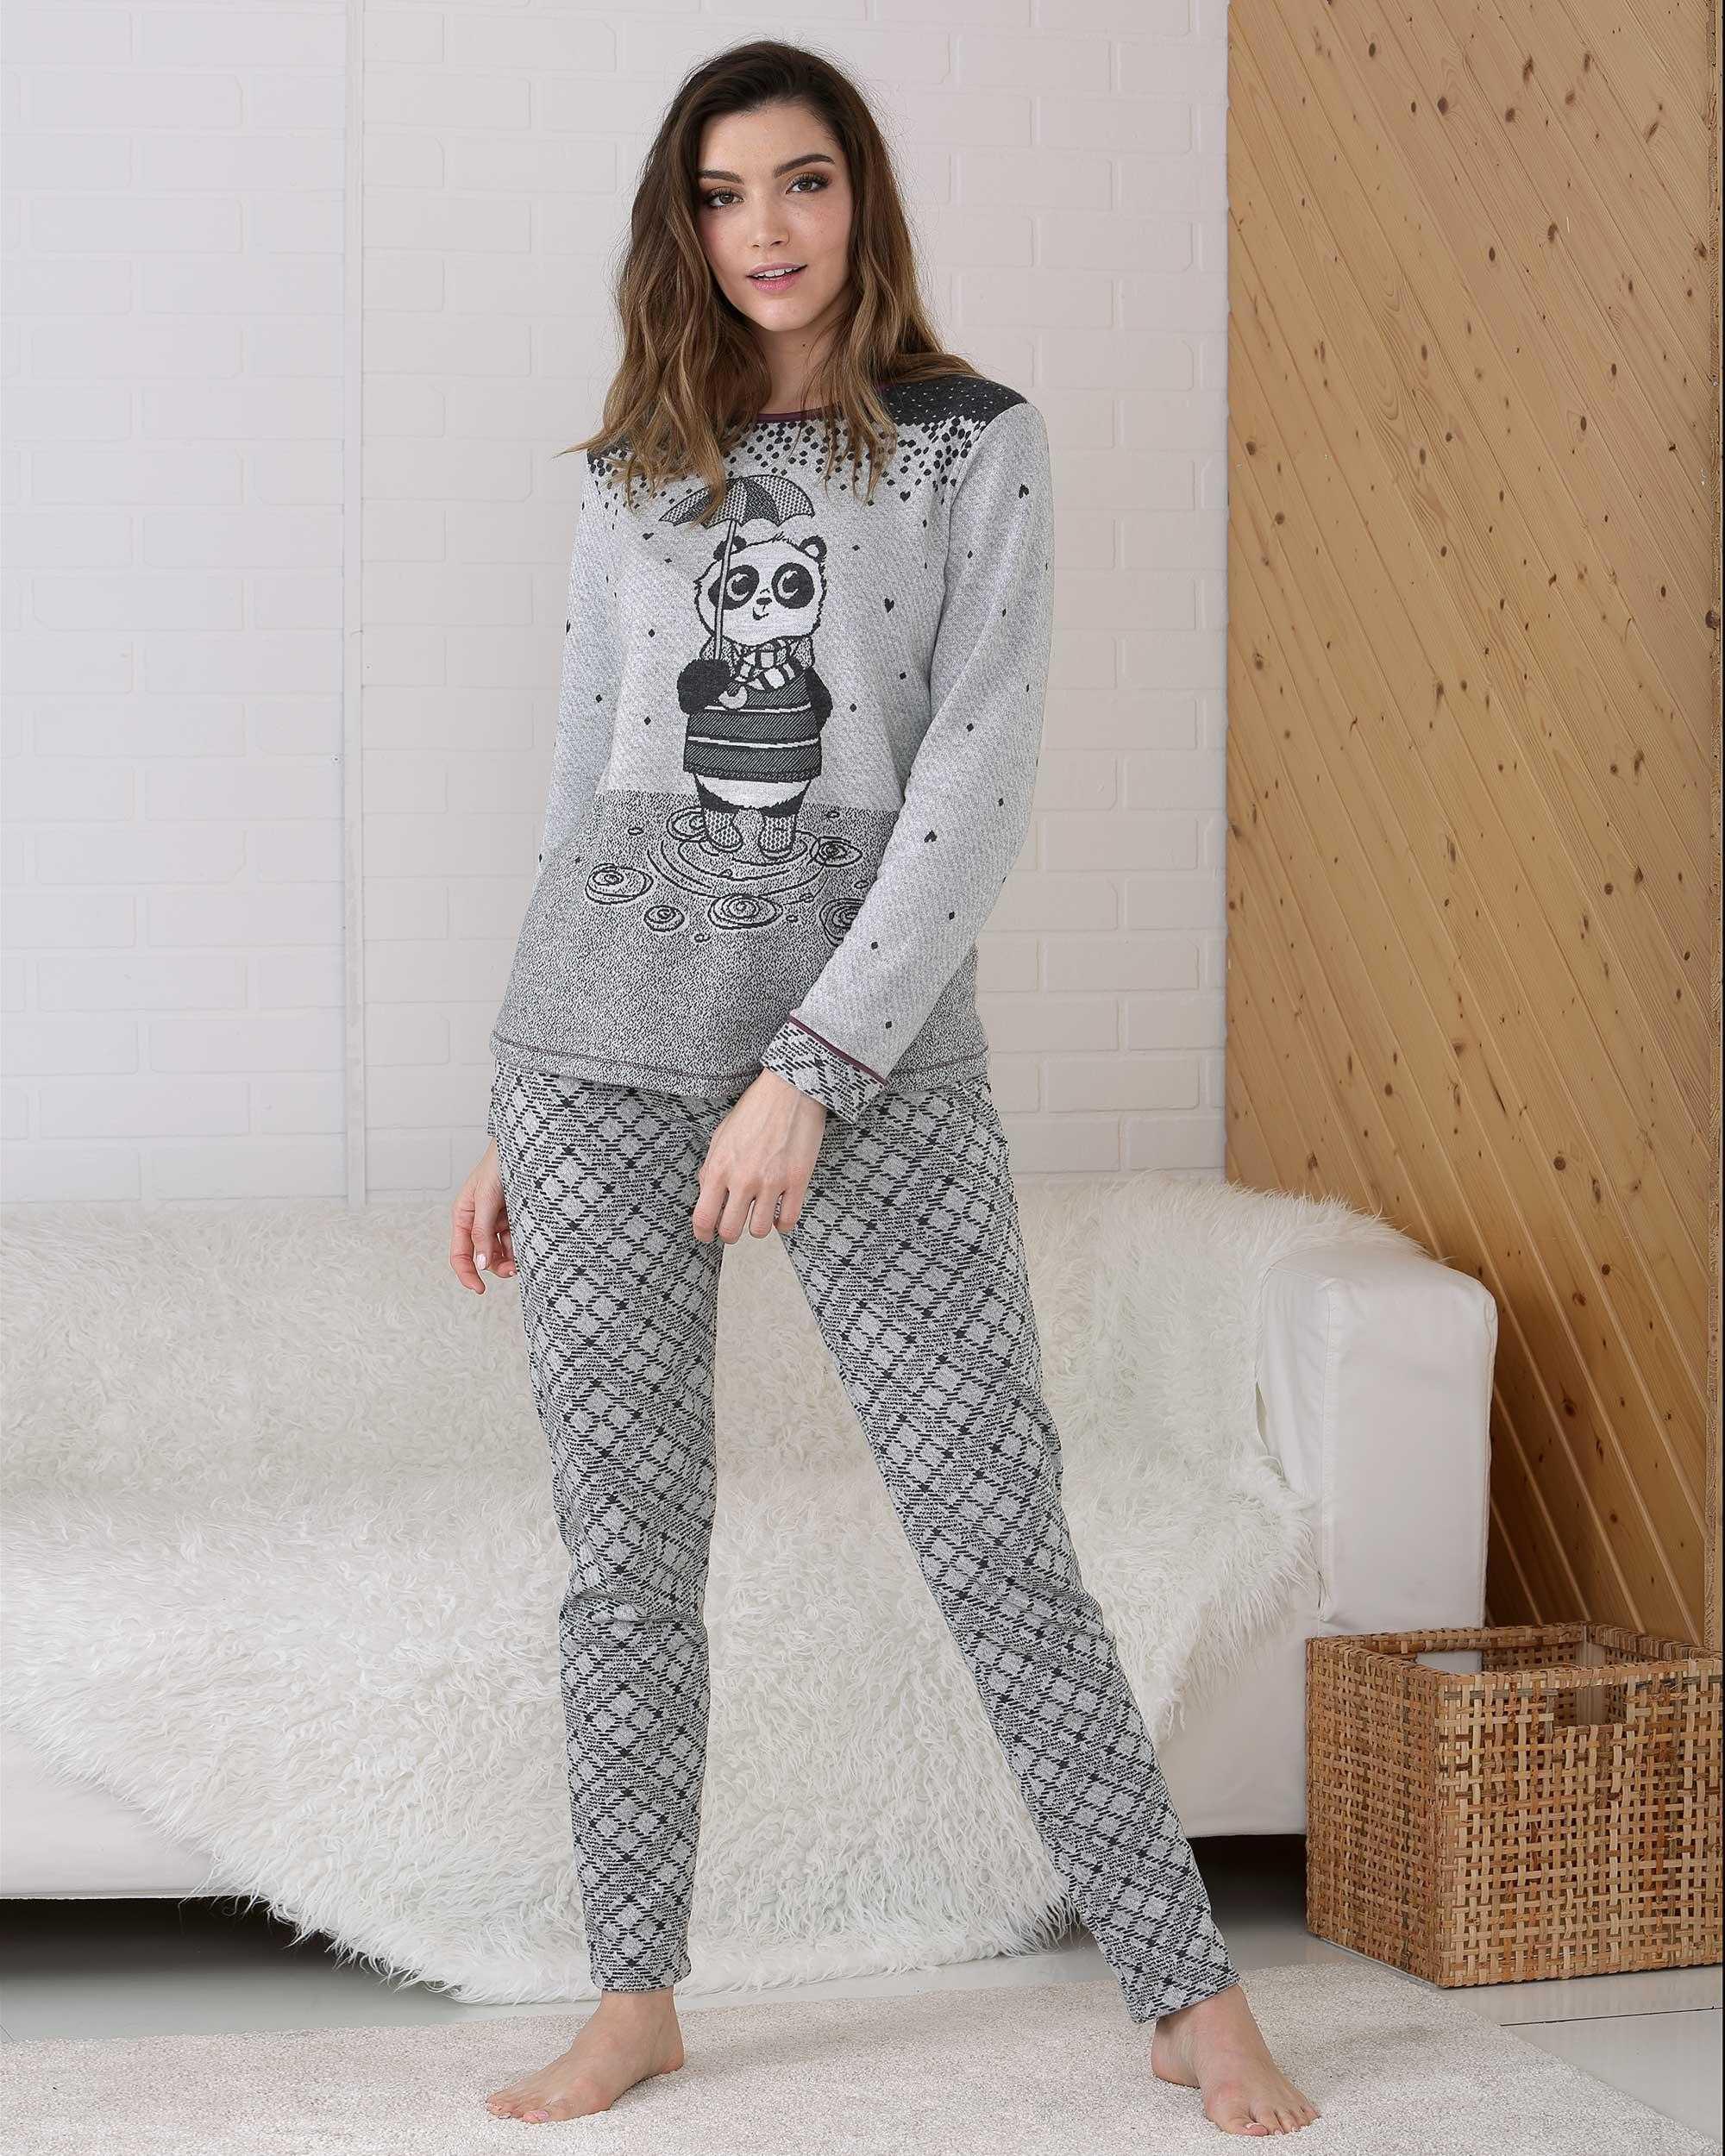 Pijama Señora Panda Massana COLOR: gris; TALLAS: s, m, l, xl, xxl  - Lencería noche  - PEPI GUERRA